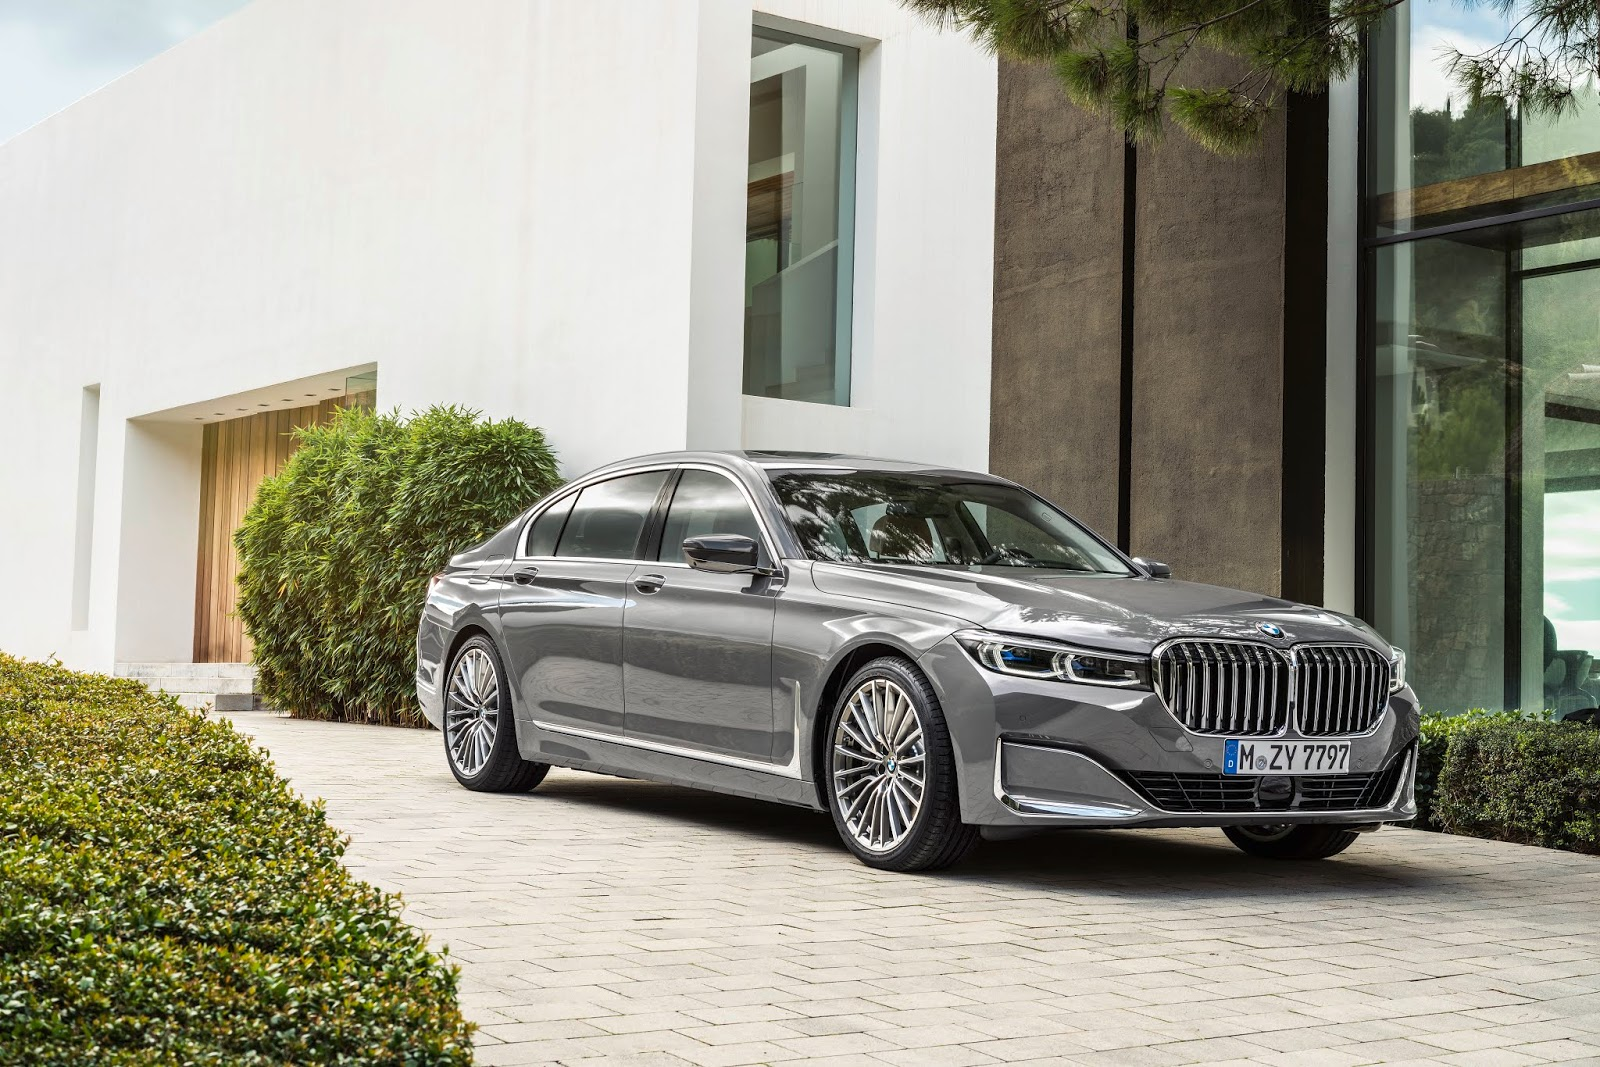 P90333086 highRes the new bmw 7 series Τα αστέρια της BMW για τη 89η Διεθνή Έκθεση Αυτοκινήτου της Γενεύης BMW, BMW 7-series, Electric cars, Hybrid, Έκθεση, Έκθεση Γενεύης